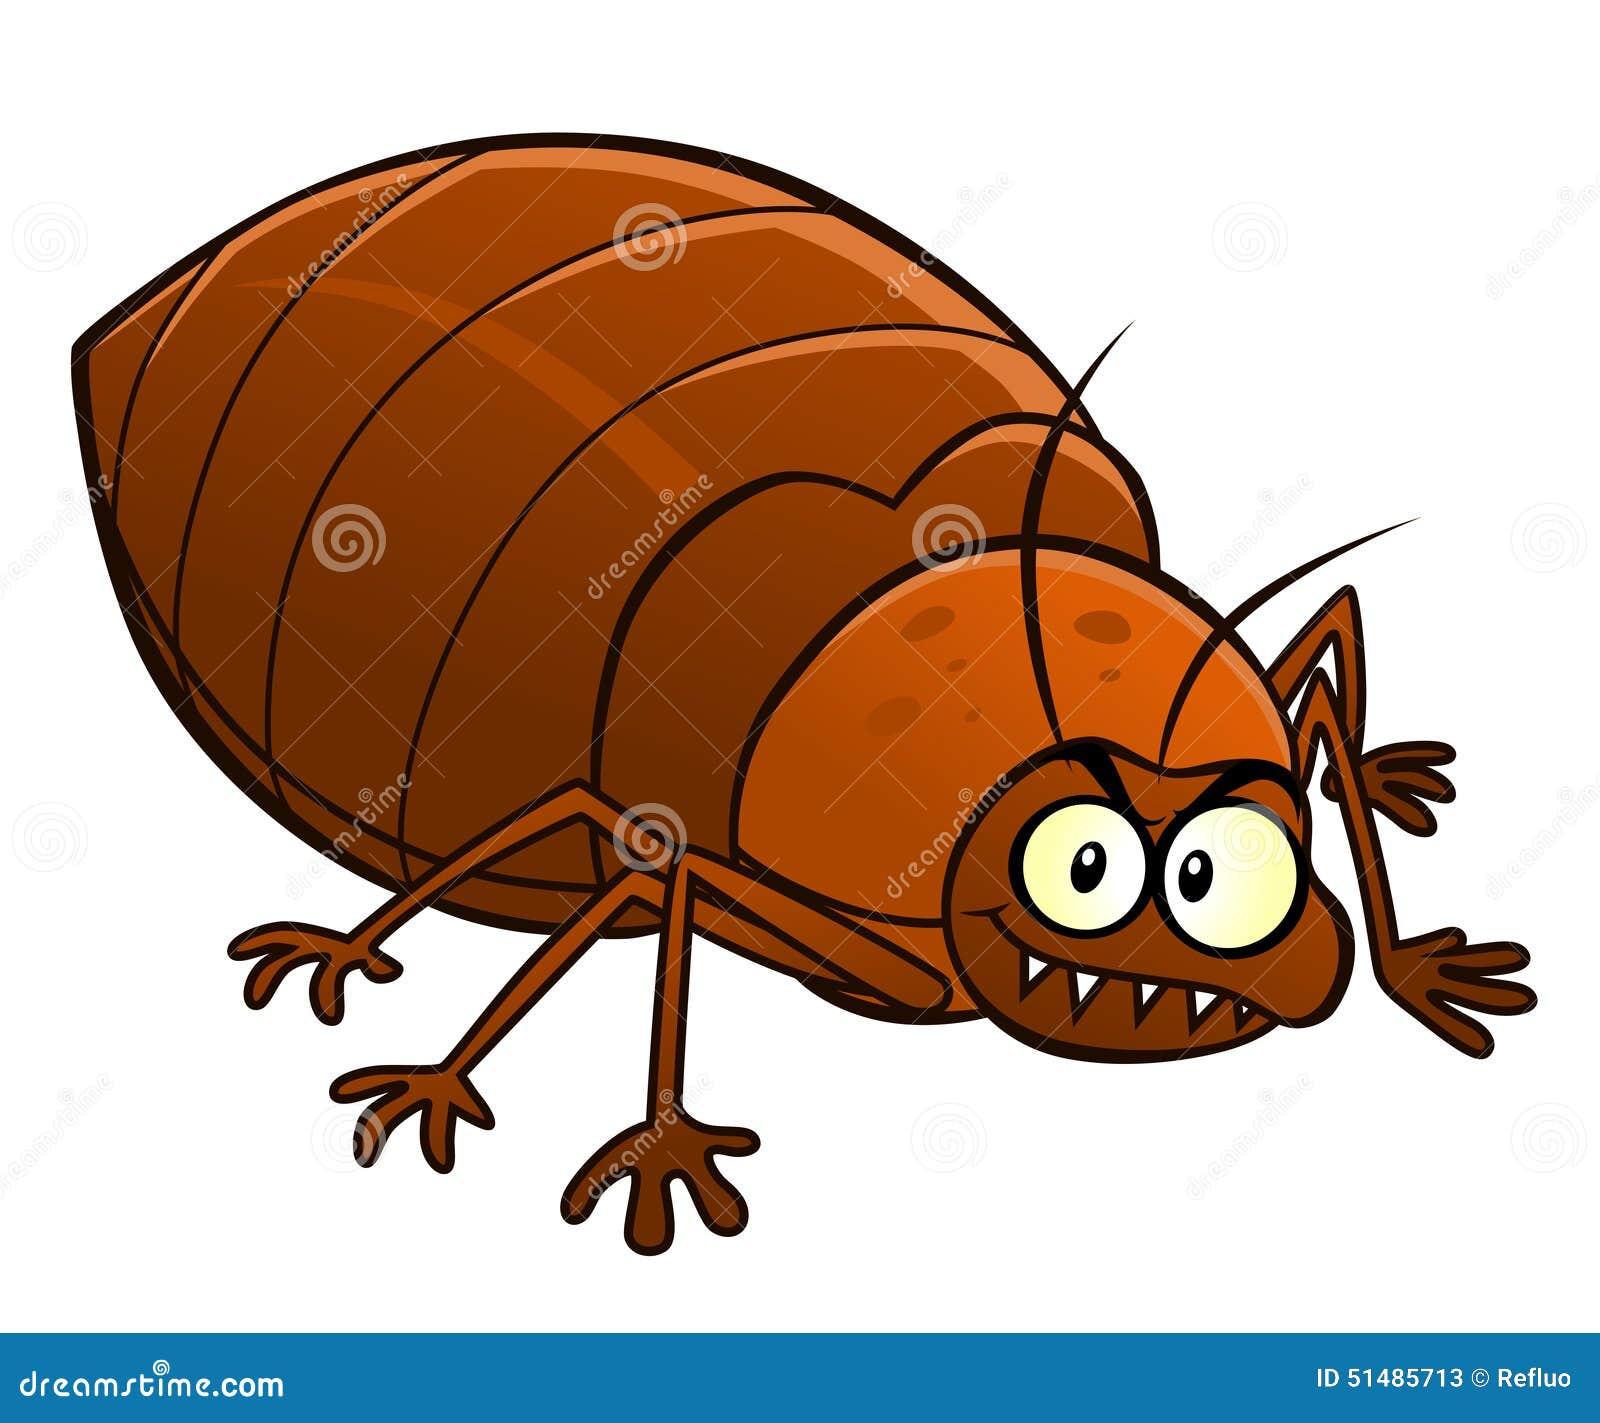 3d comic the cockroach episode 8 3